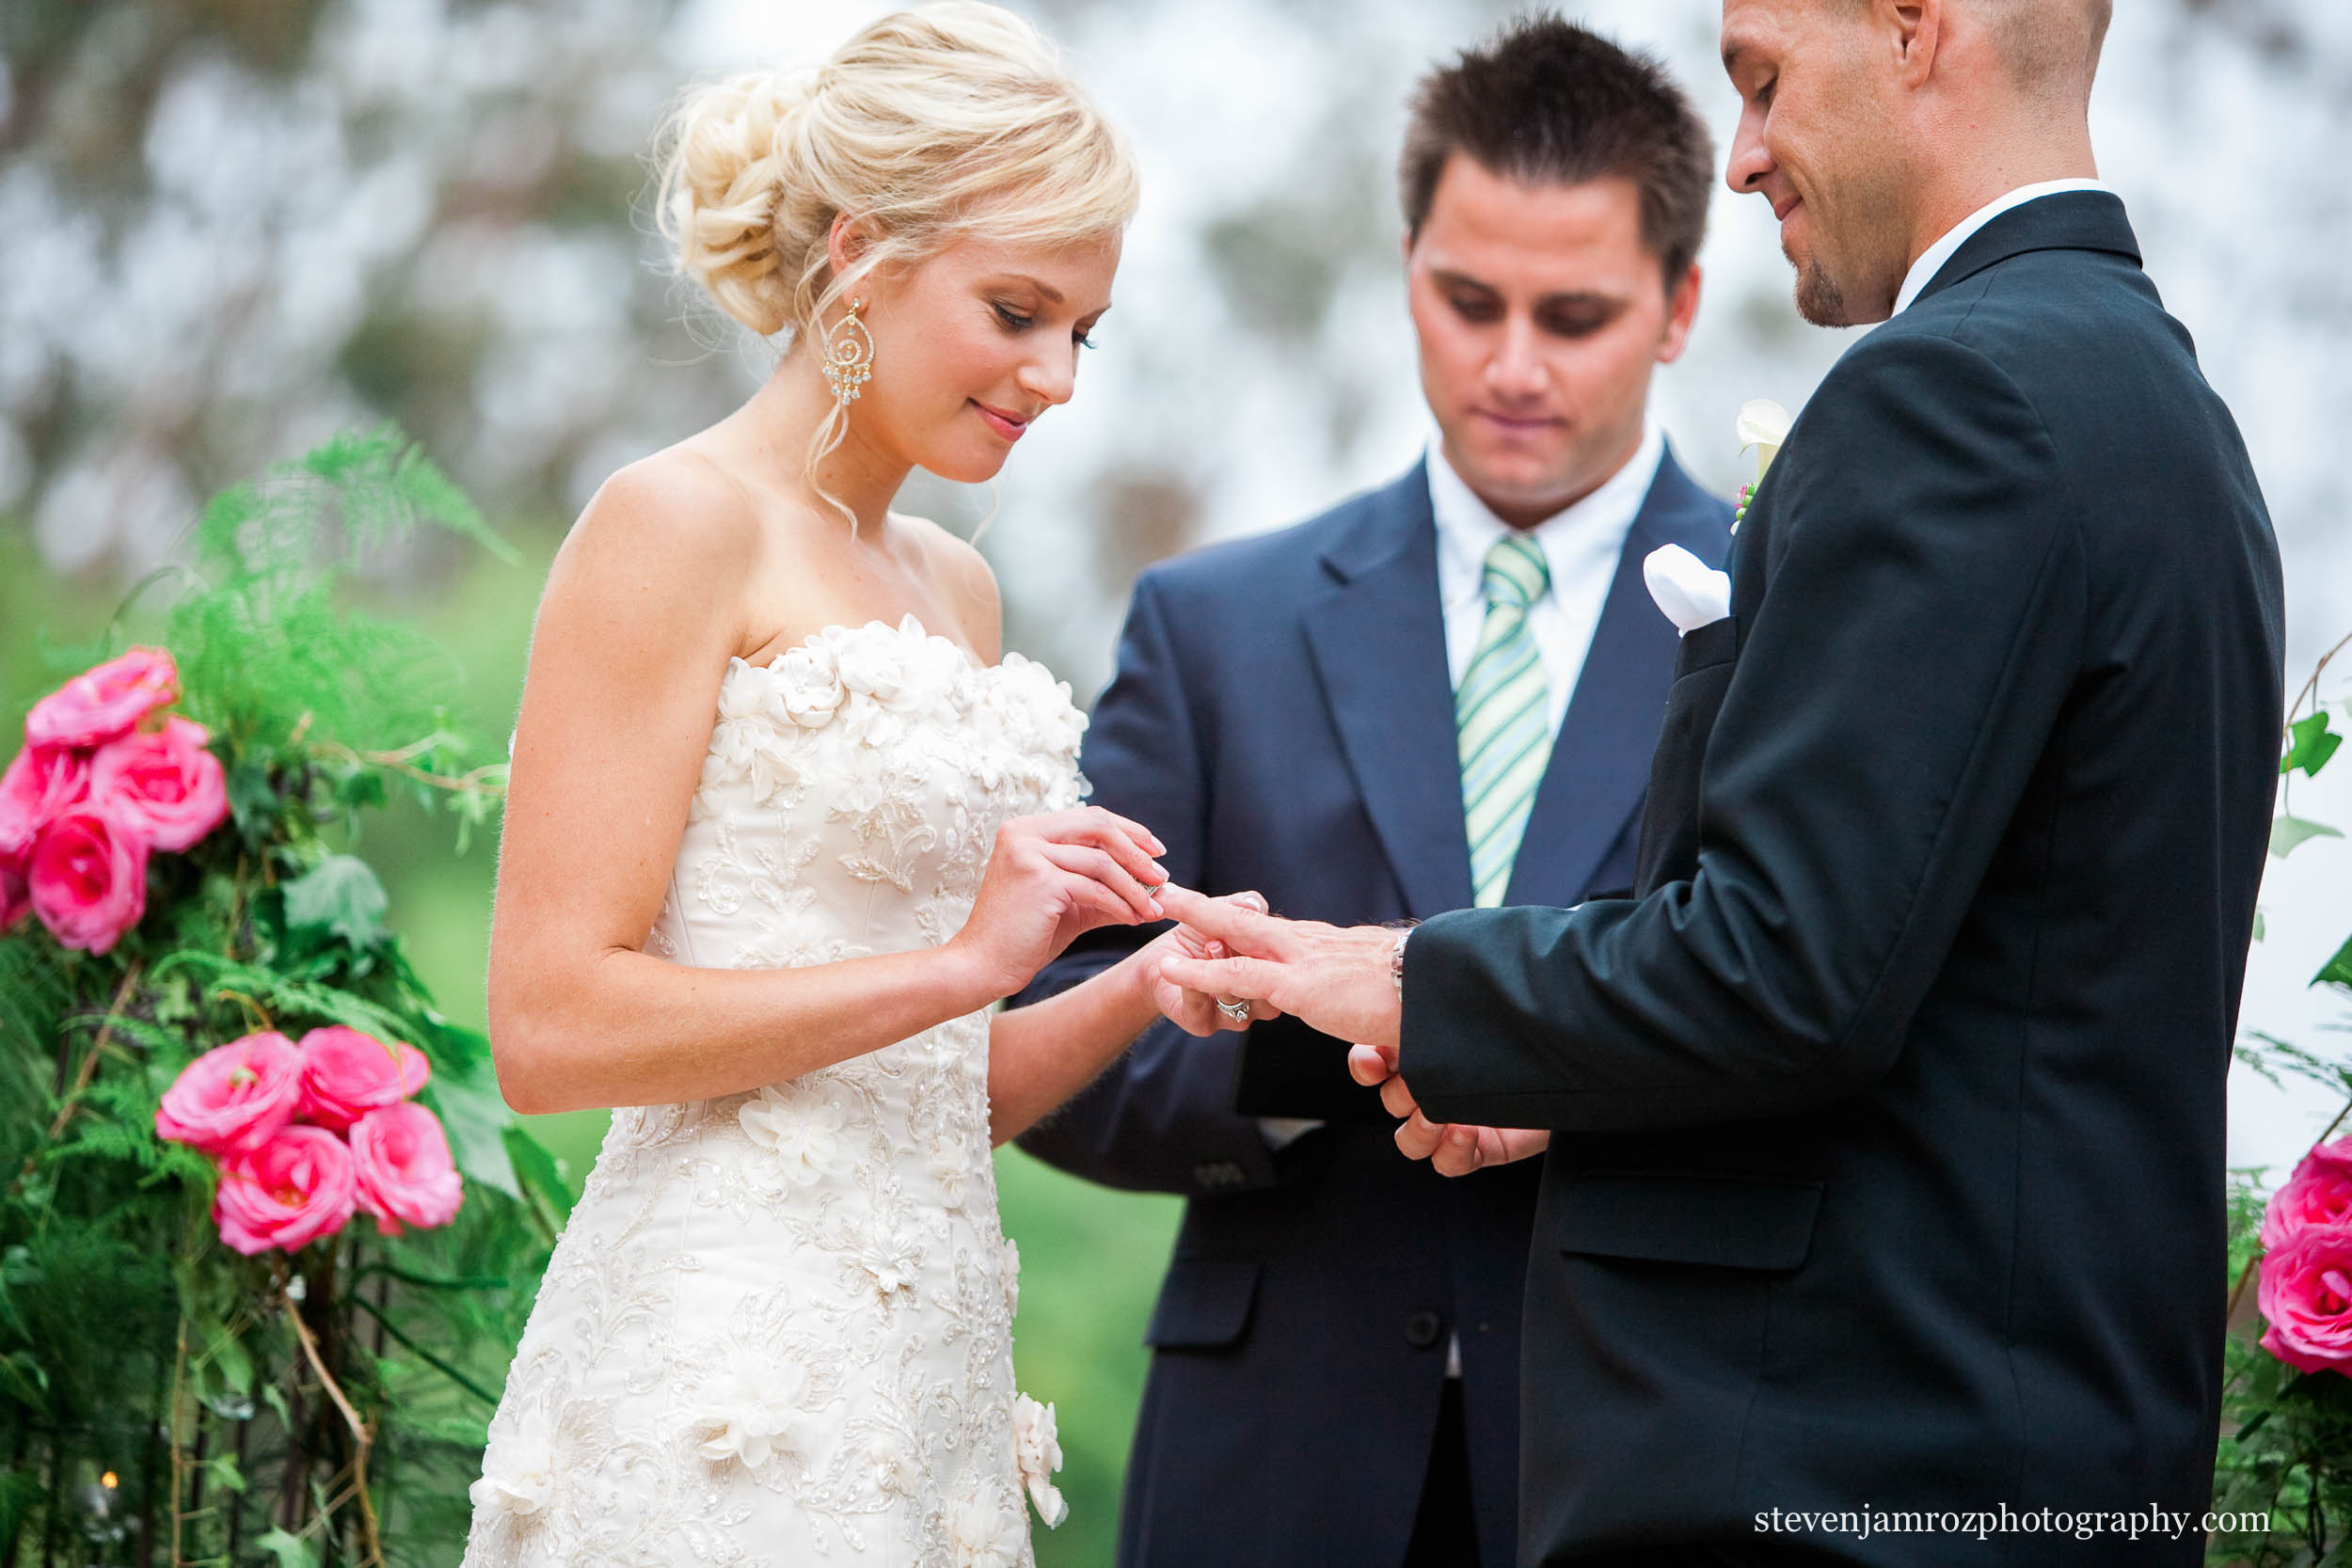 put-on-rings-raleigh-wedding-photographer-steven-jamroz-photography-0004.jpg